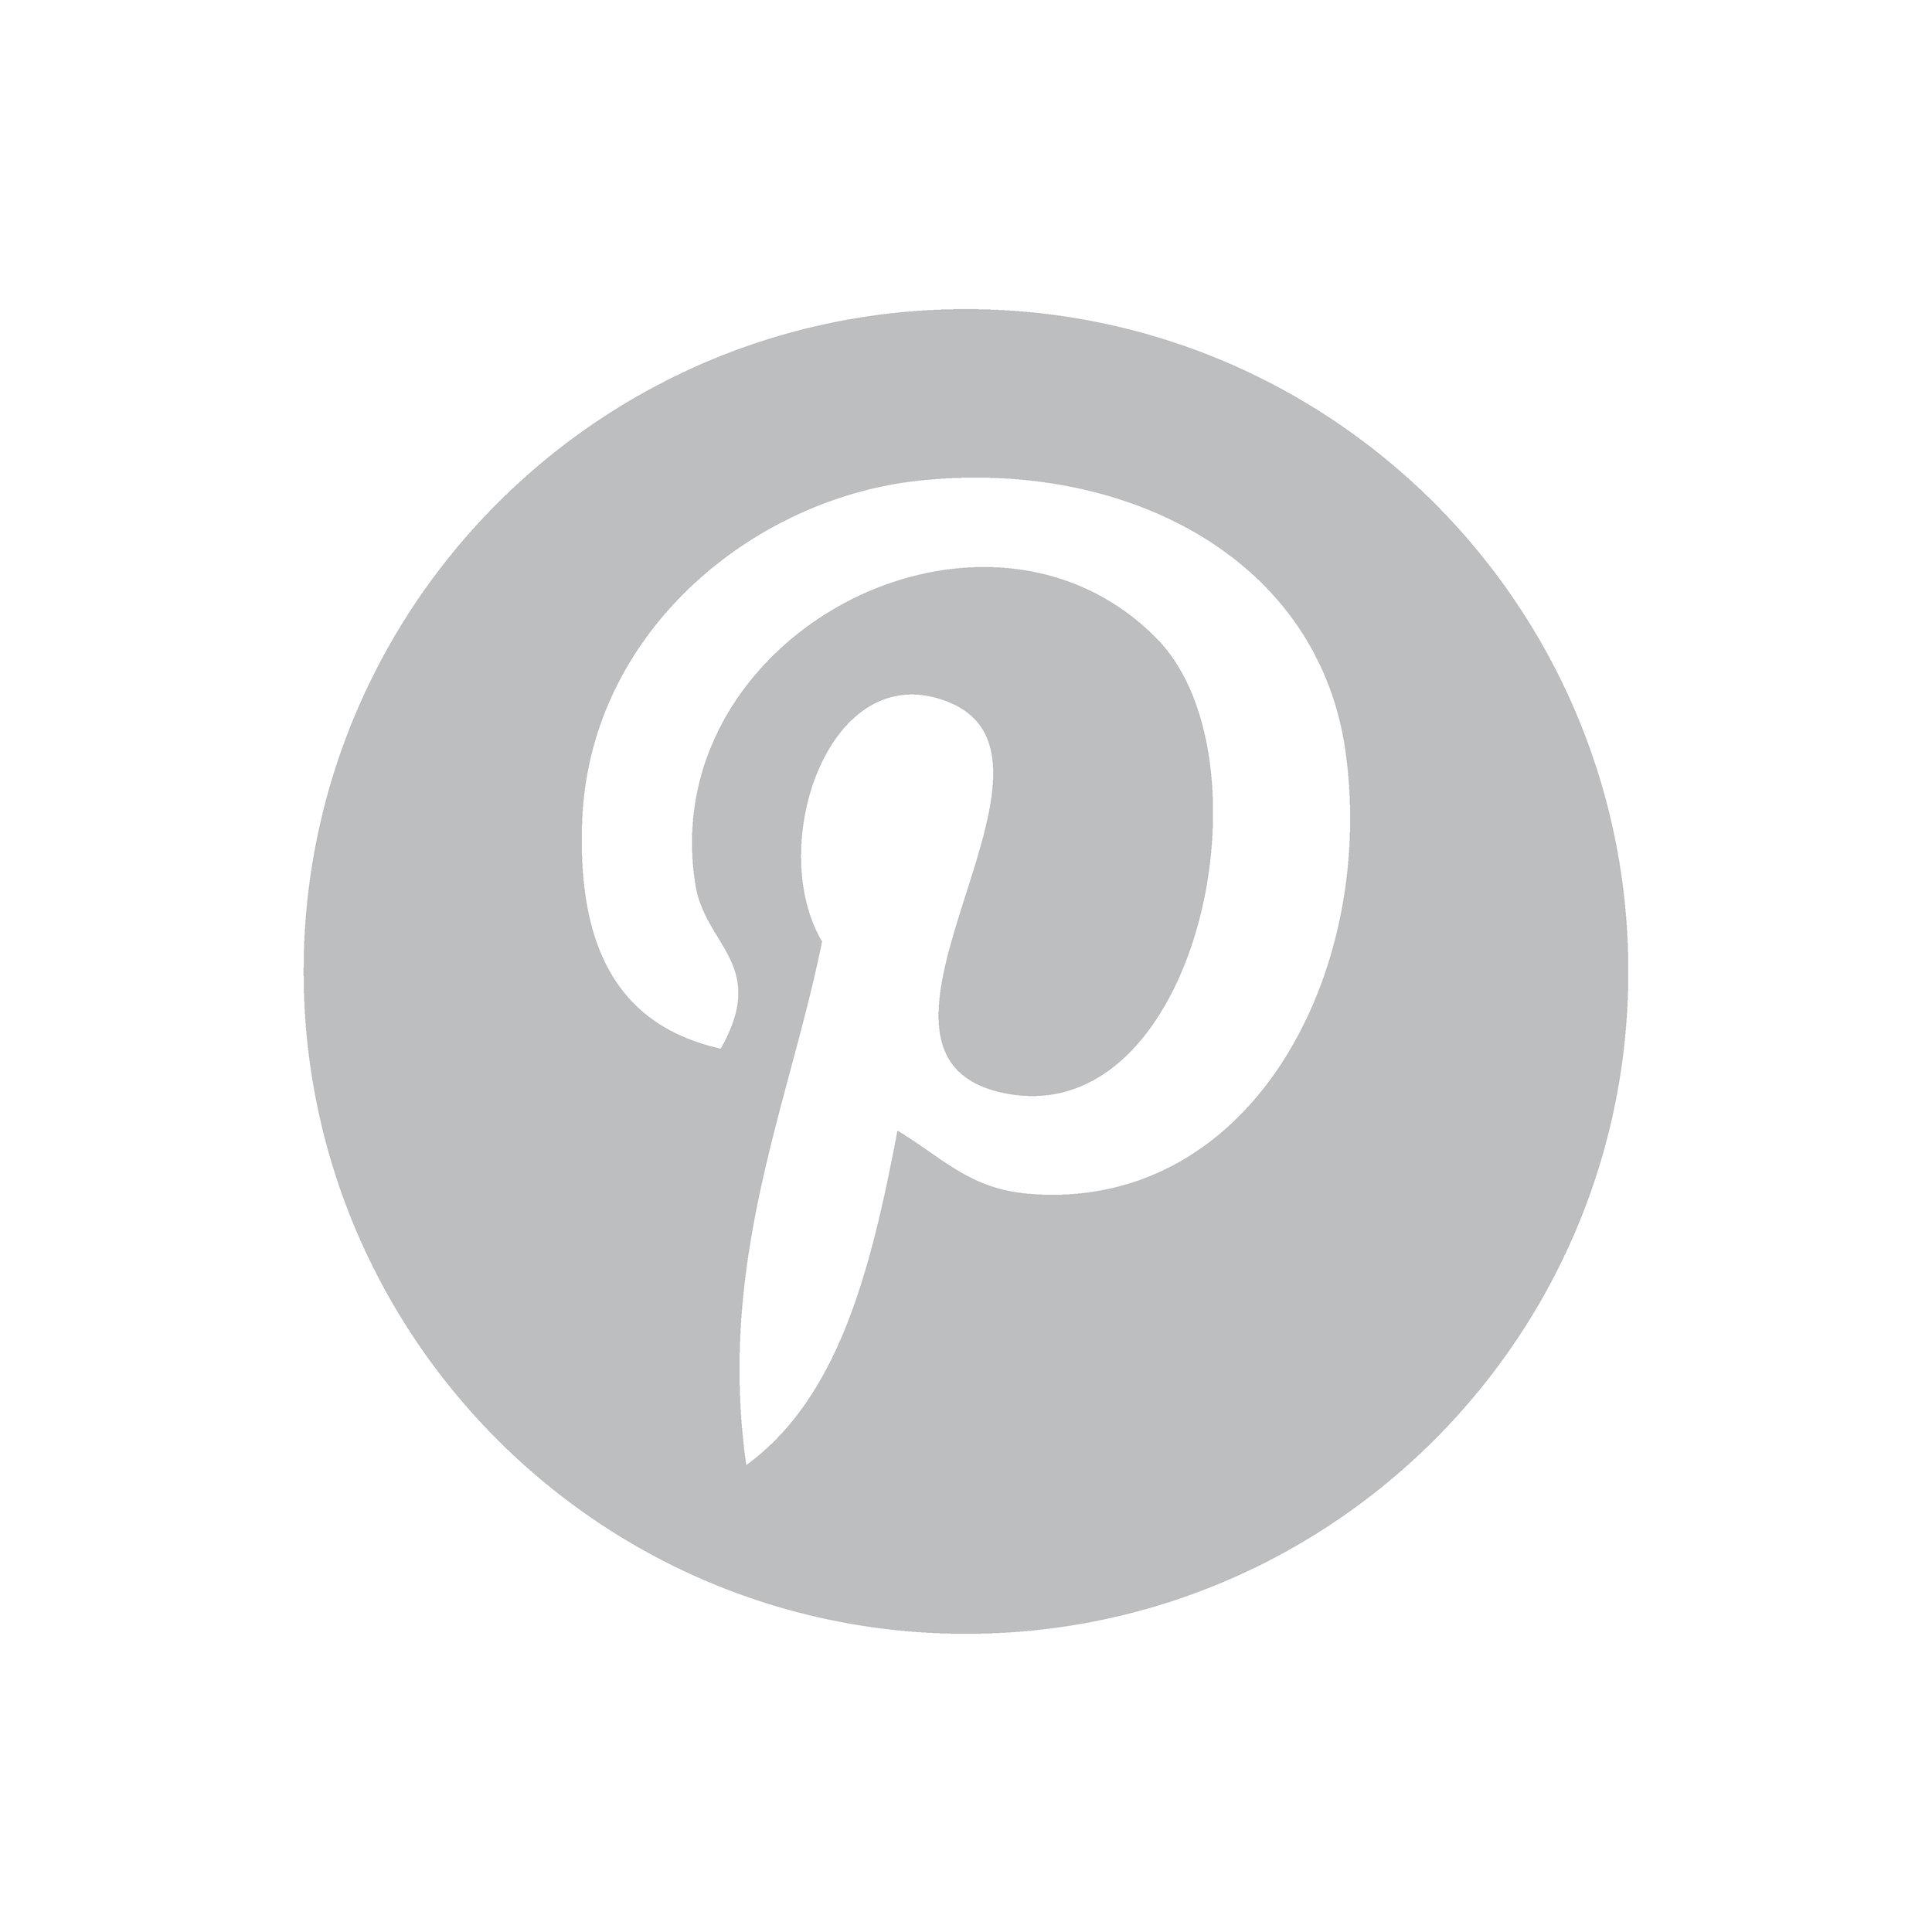 https://www.pinterest.com/fashionablehost/